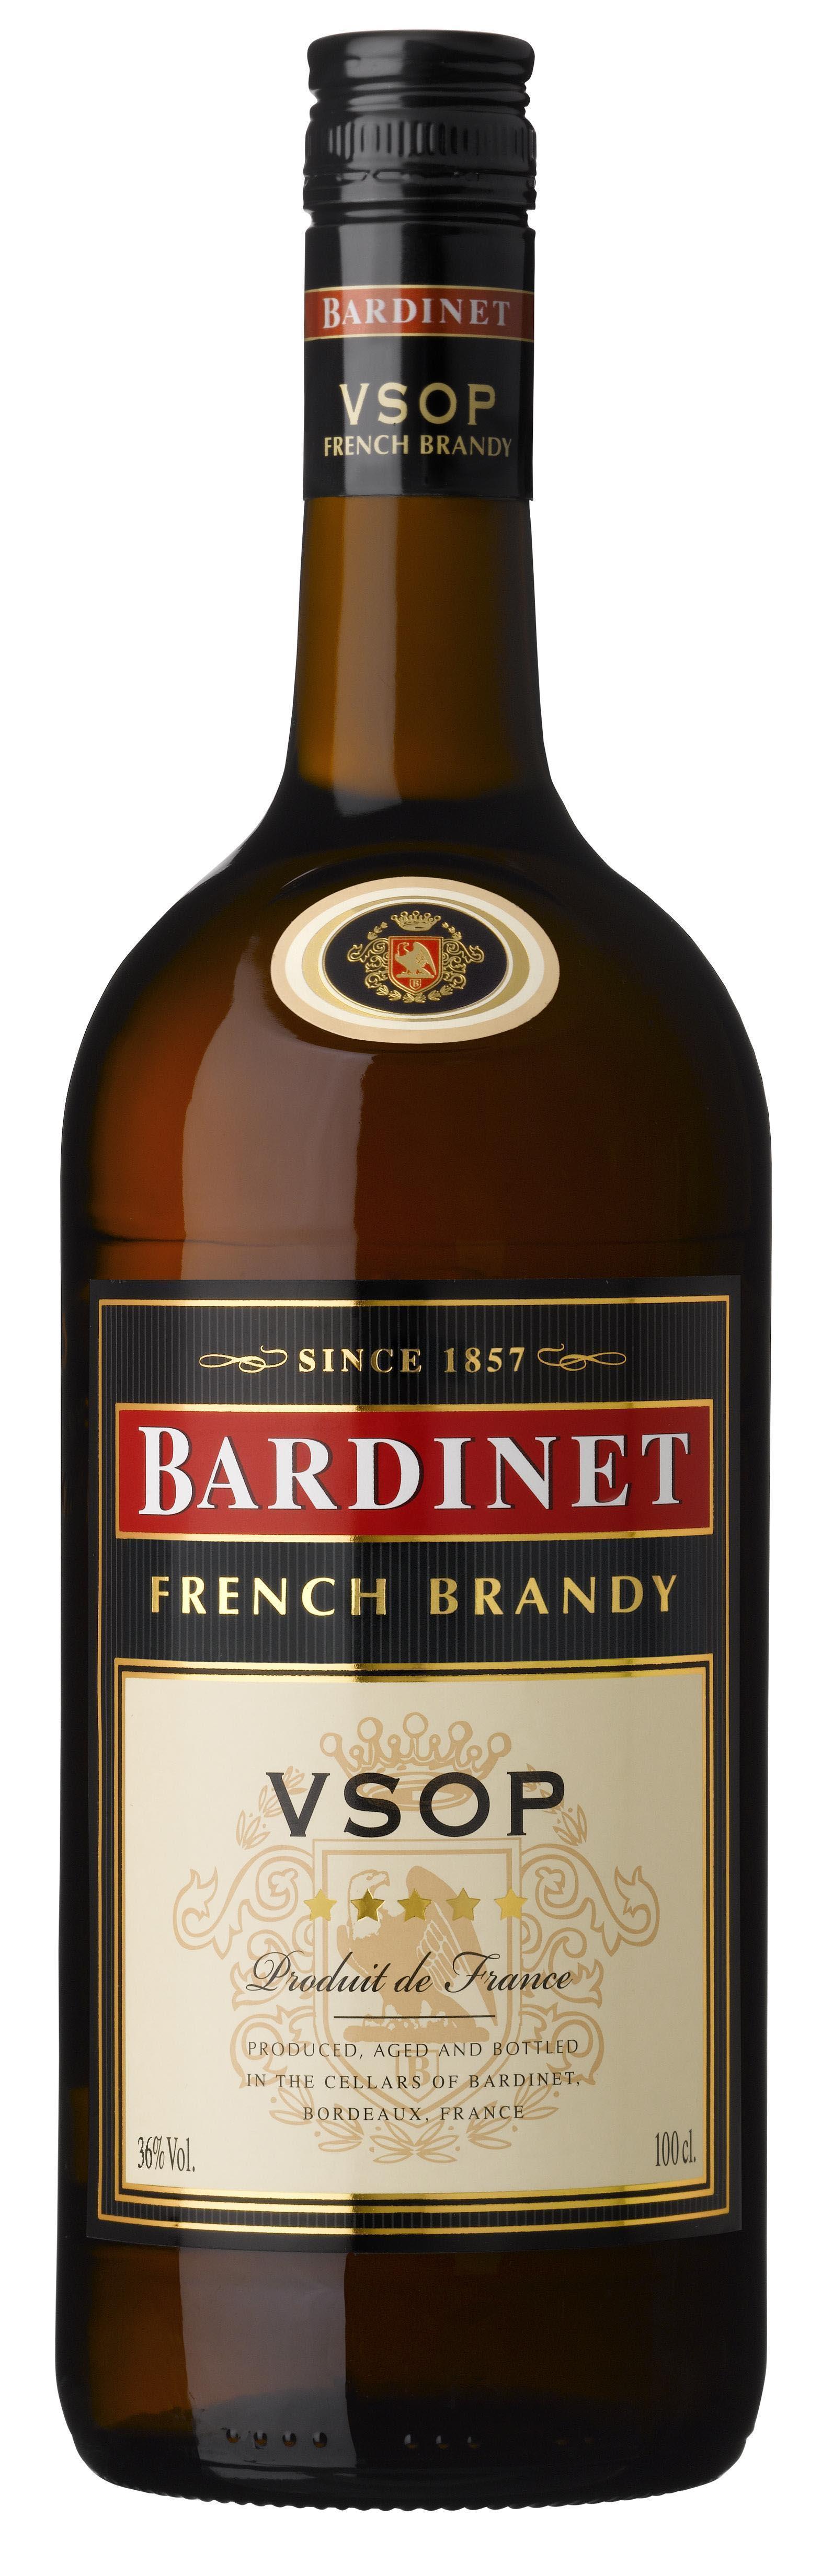 Bardinet VSOP, French Brandy